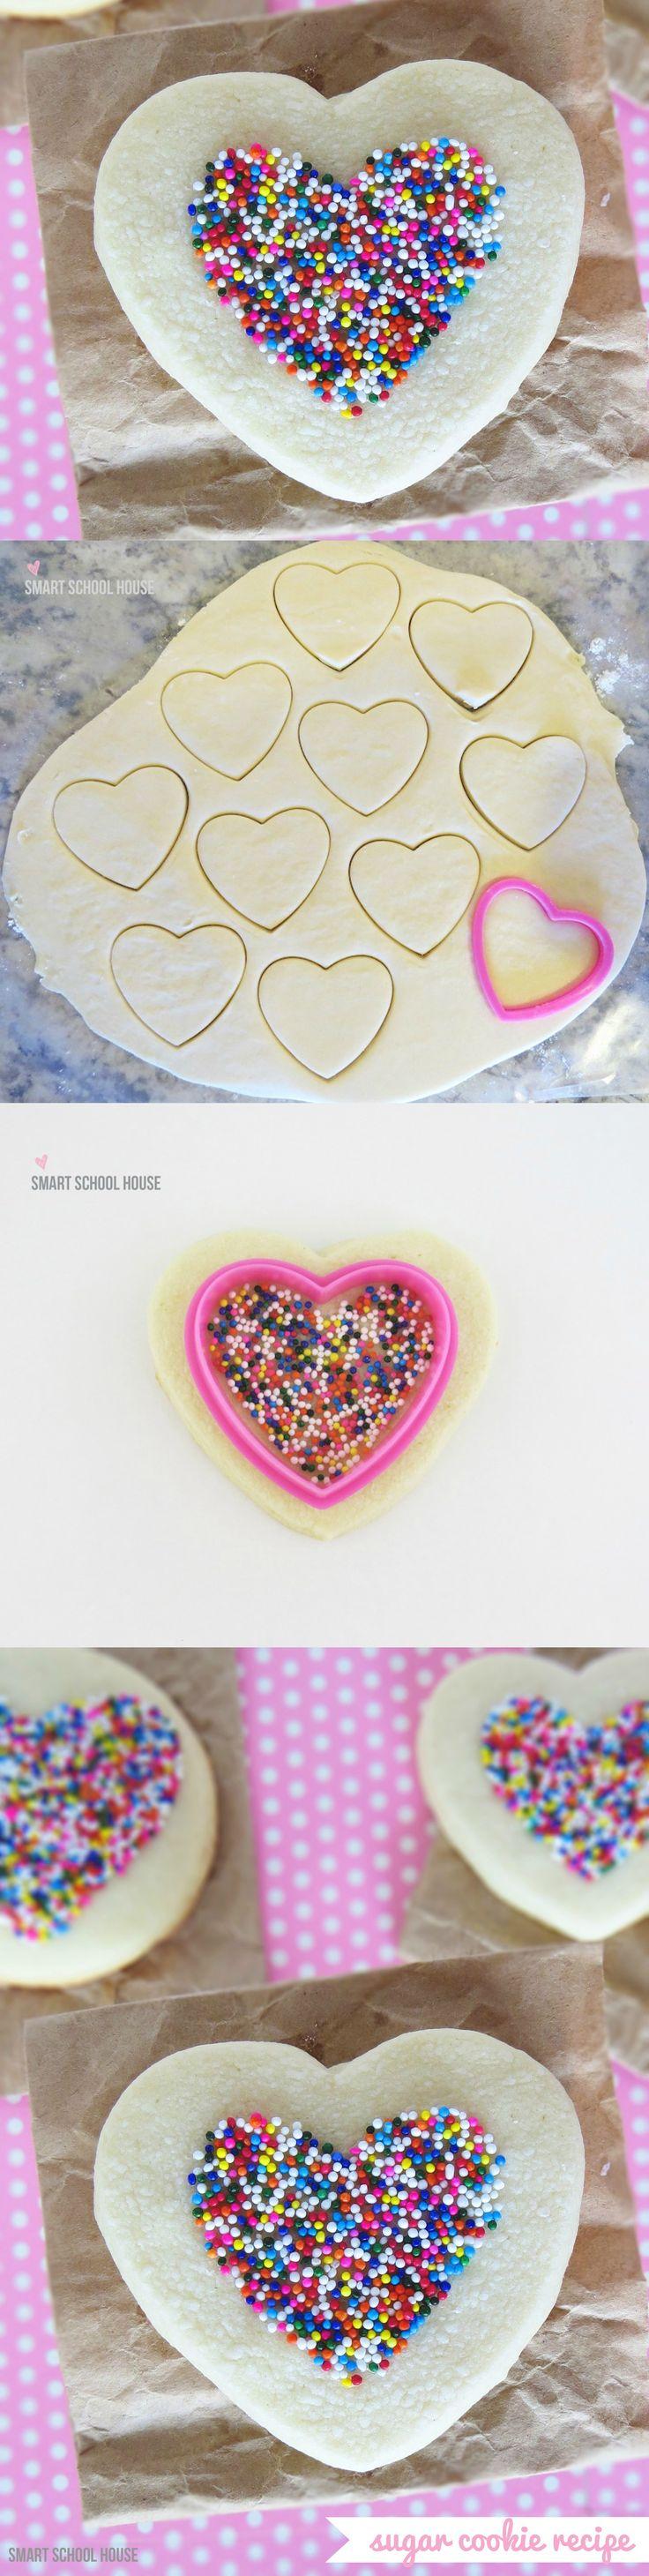 A simple way to make sprinkled sugar cookies. I love easy!